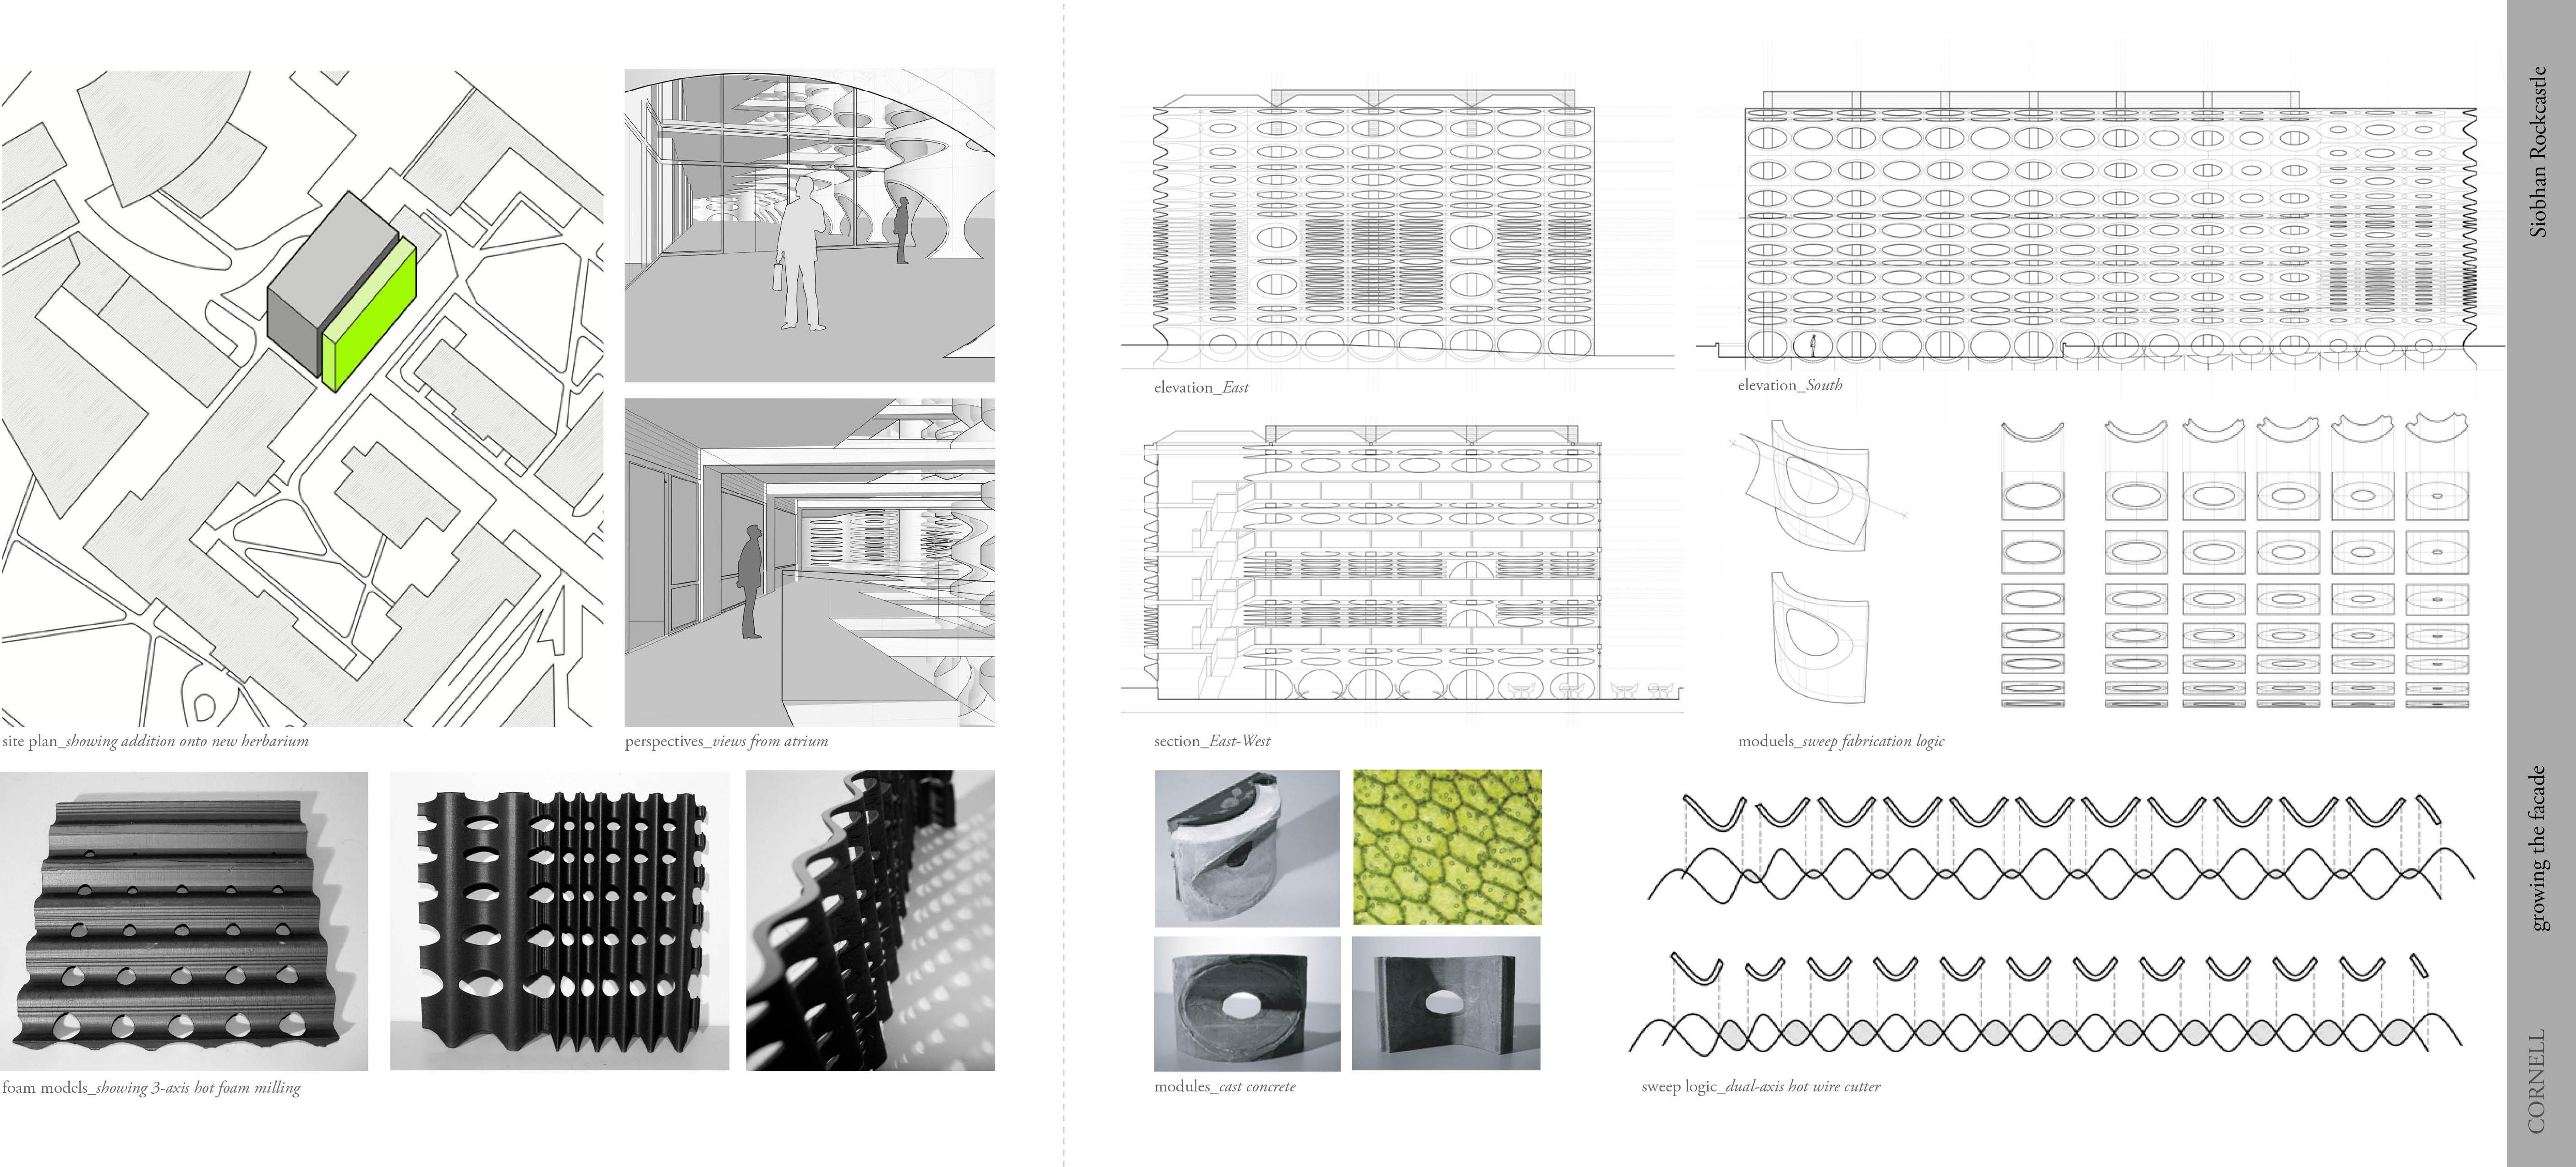 Growing The Facade Siobhan Rockcastle Hot Wire Foam Cutter Design Diagram